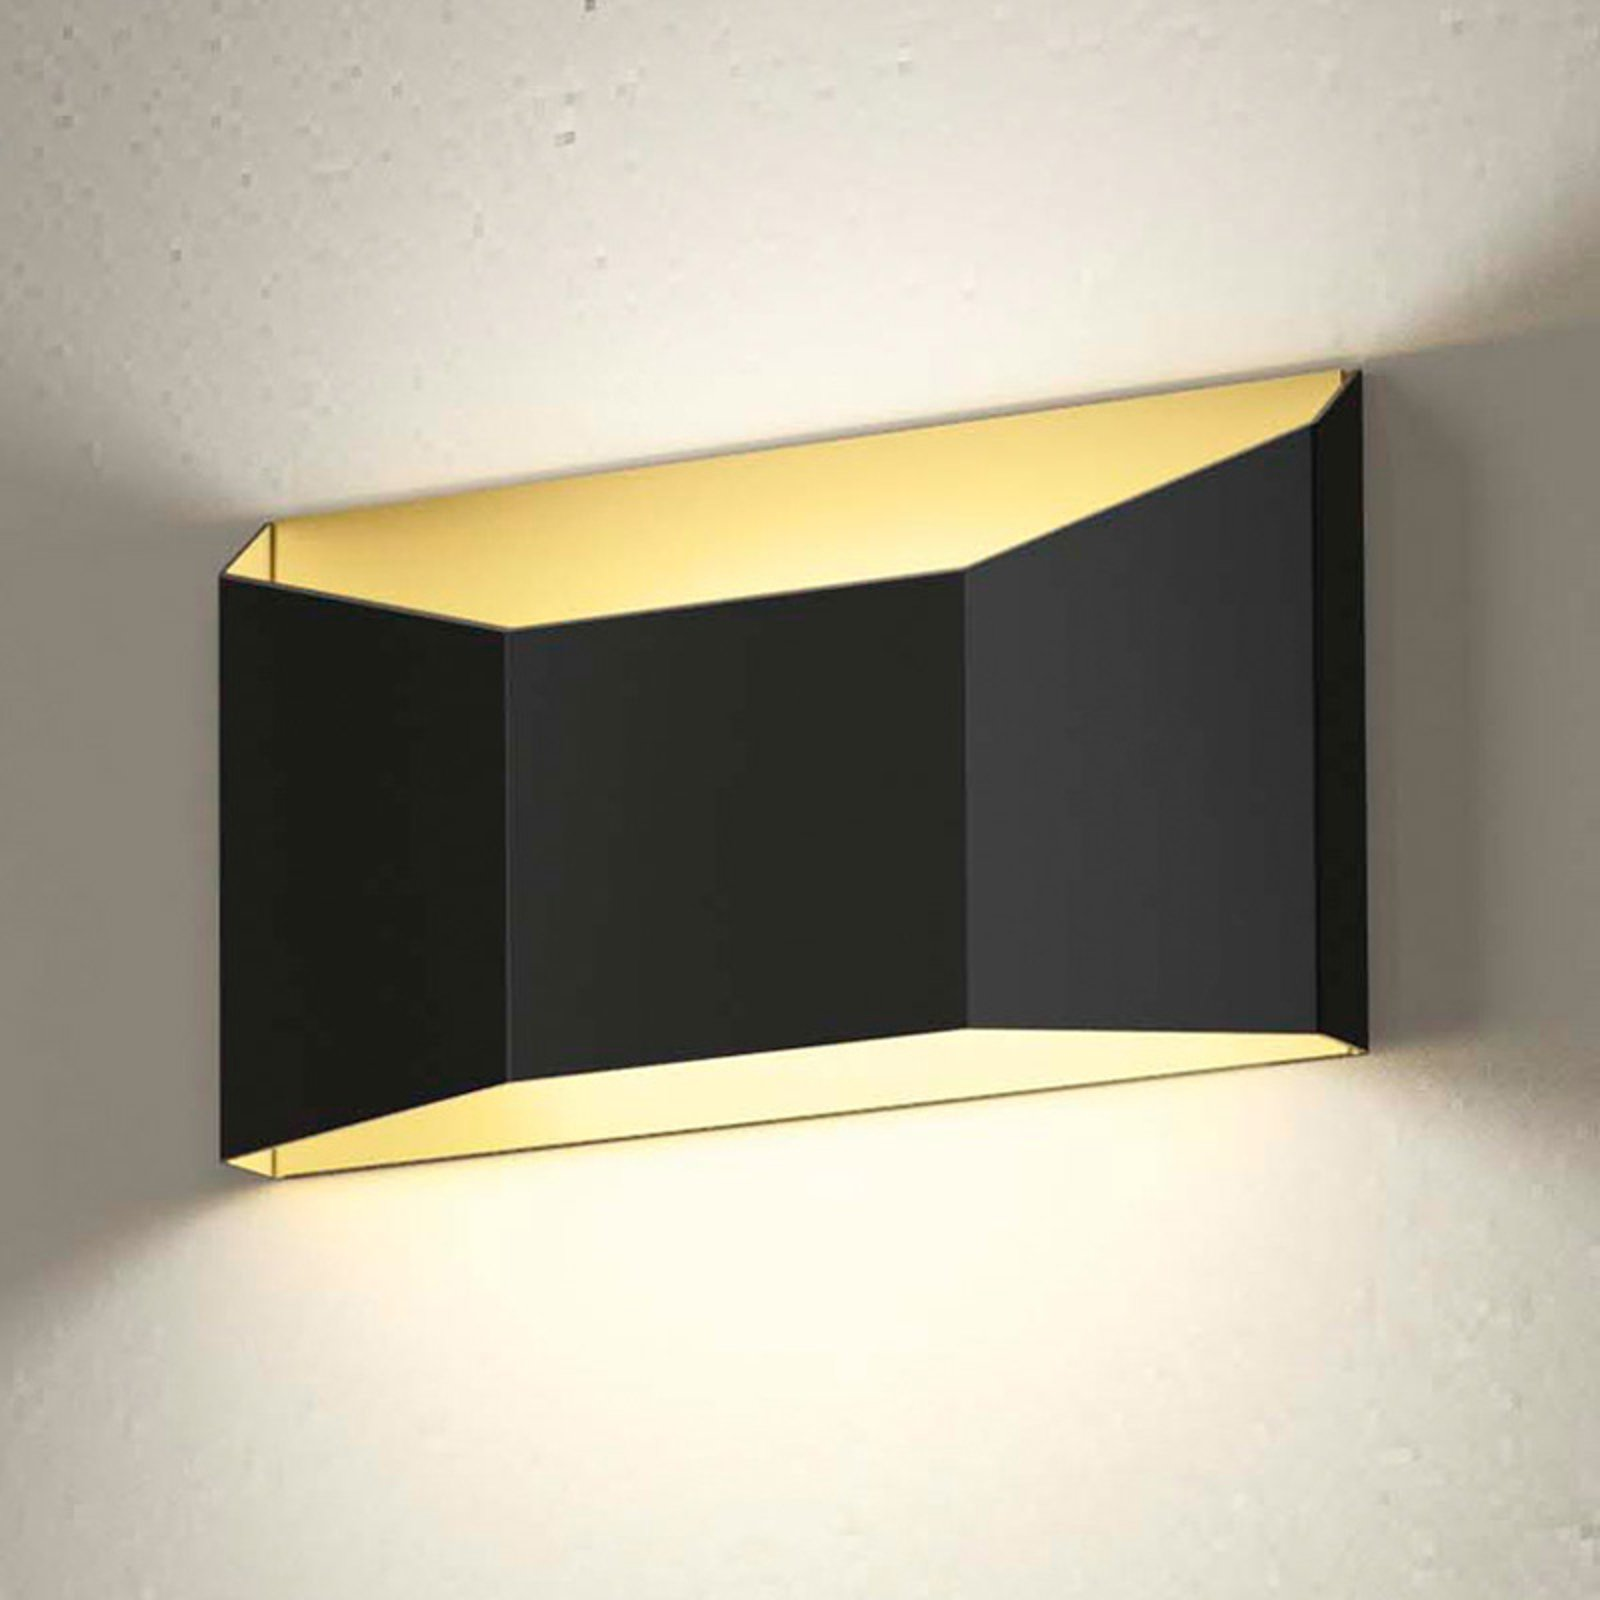 Esa tofarget LED-vegglampe i flat form